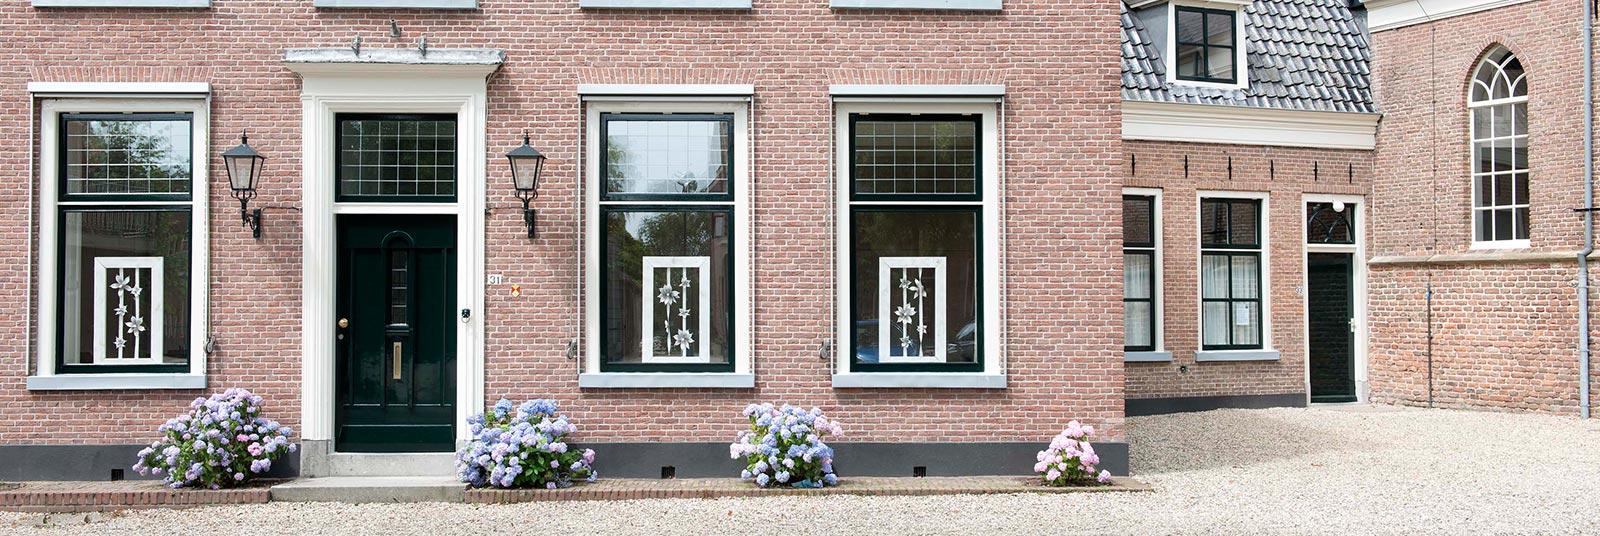 Monumentaal Schilderwerk - Header Dorpsstraat